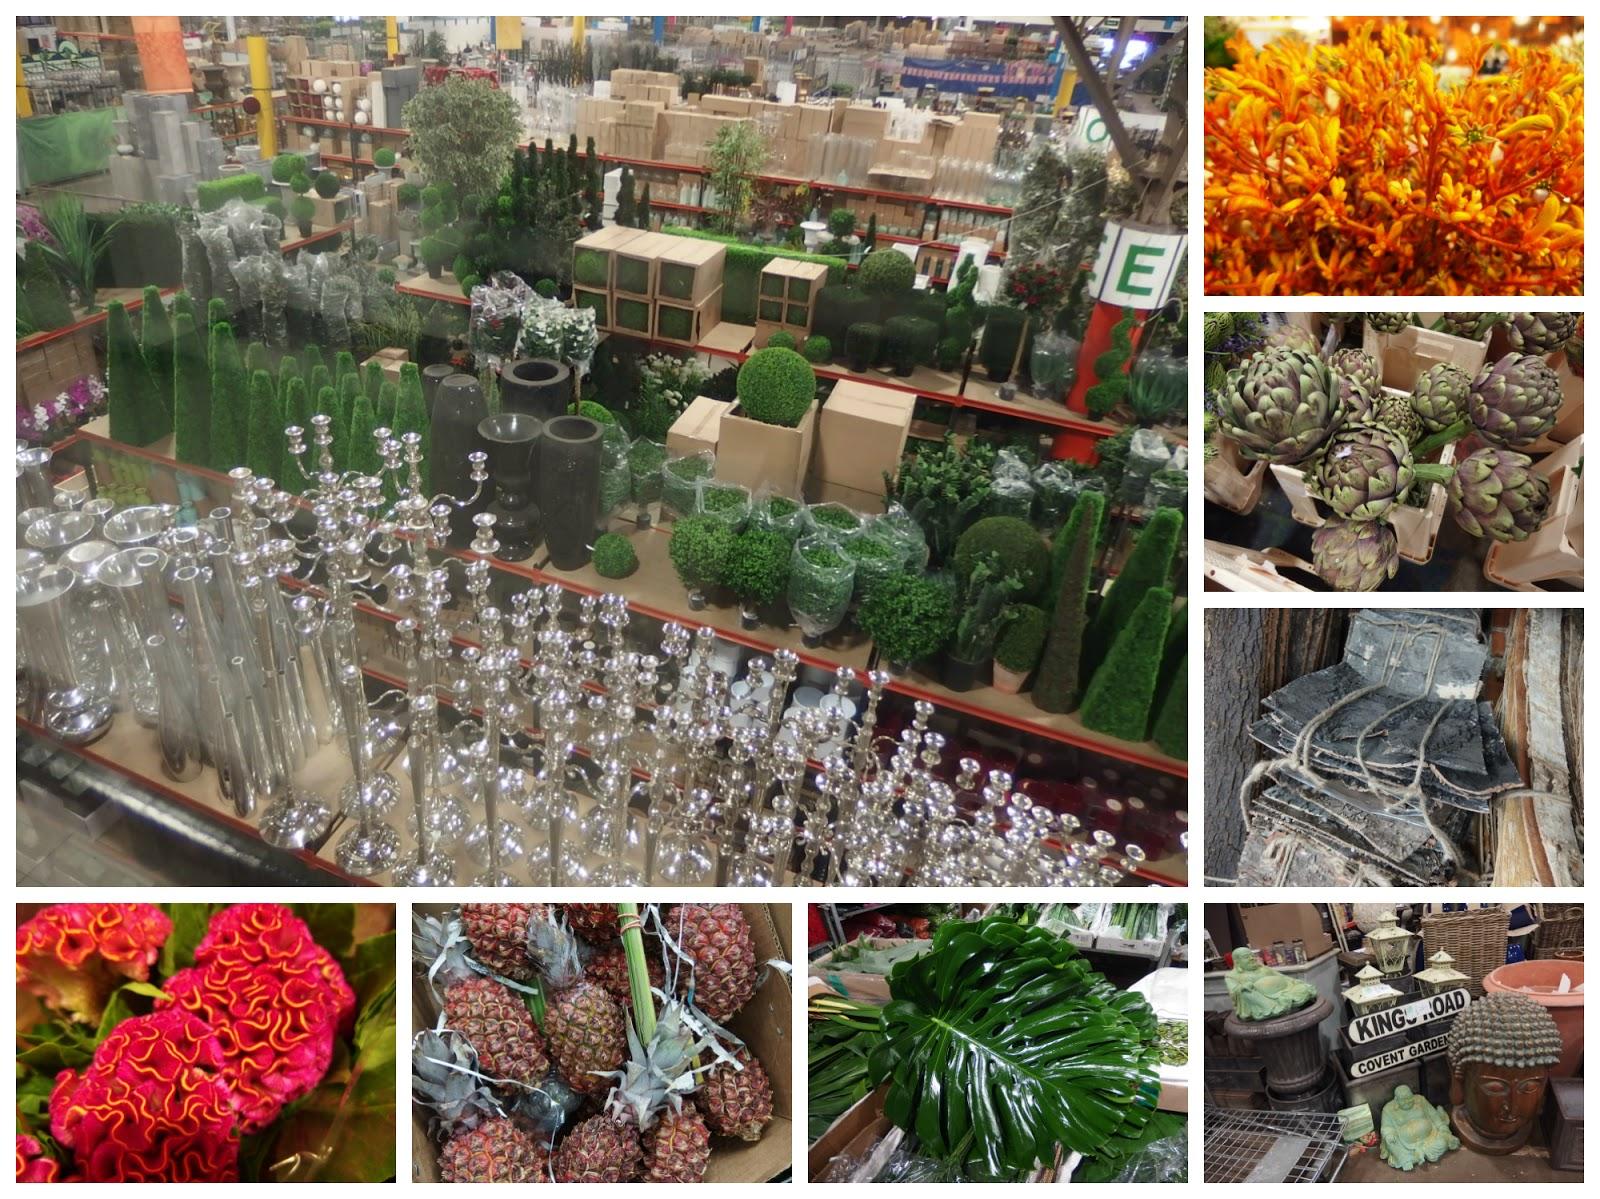 New Covent Garden Flower Market Tour